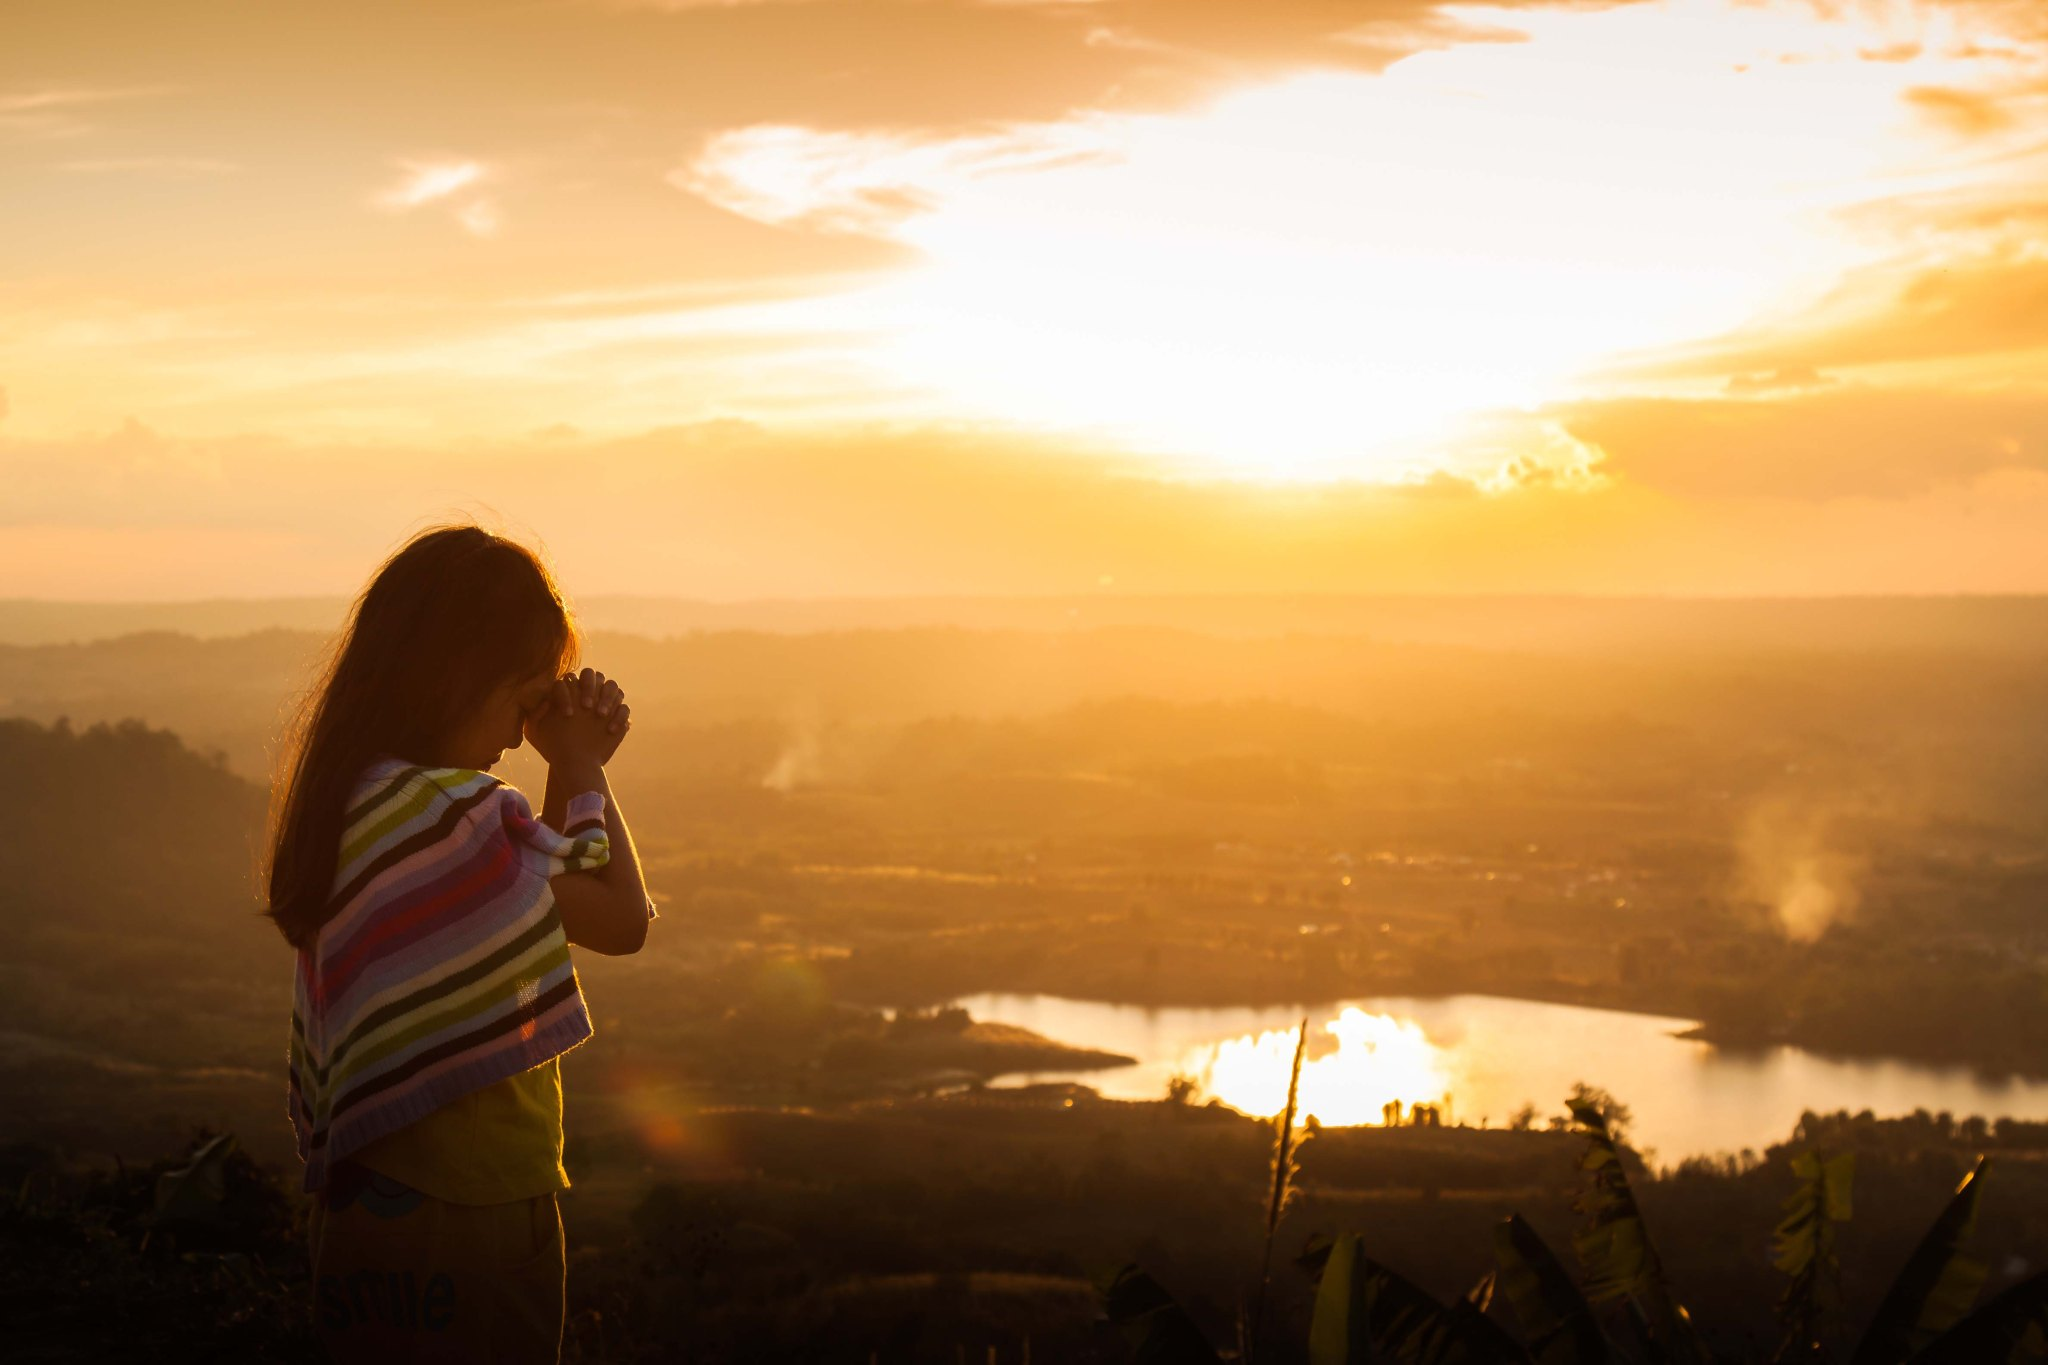 Child praying on the mountain, thank God.